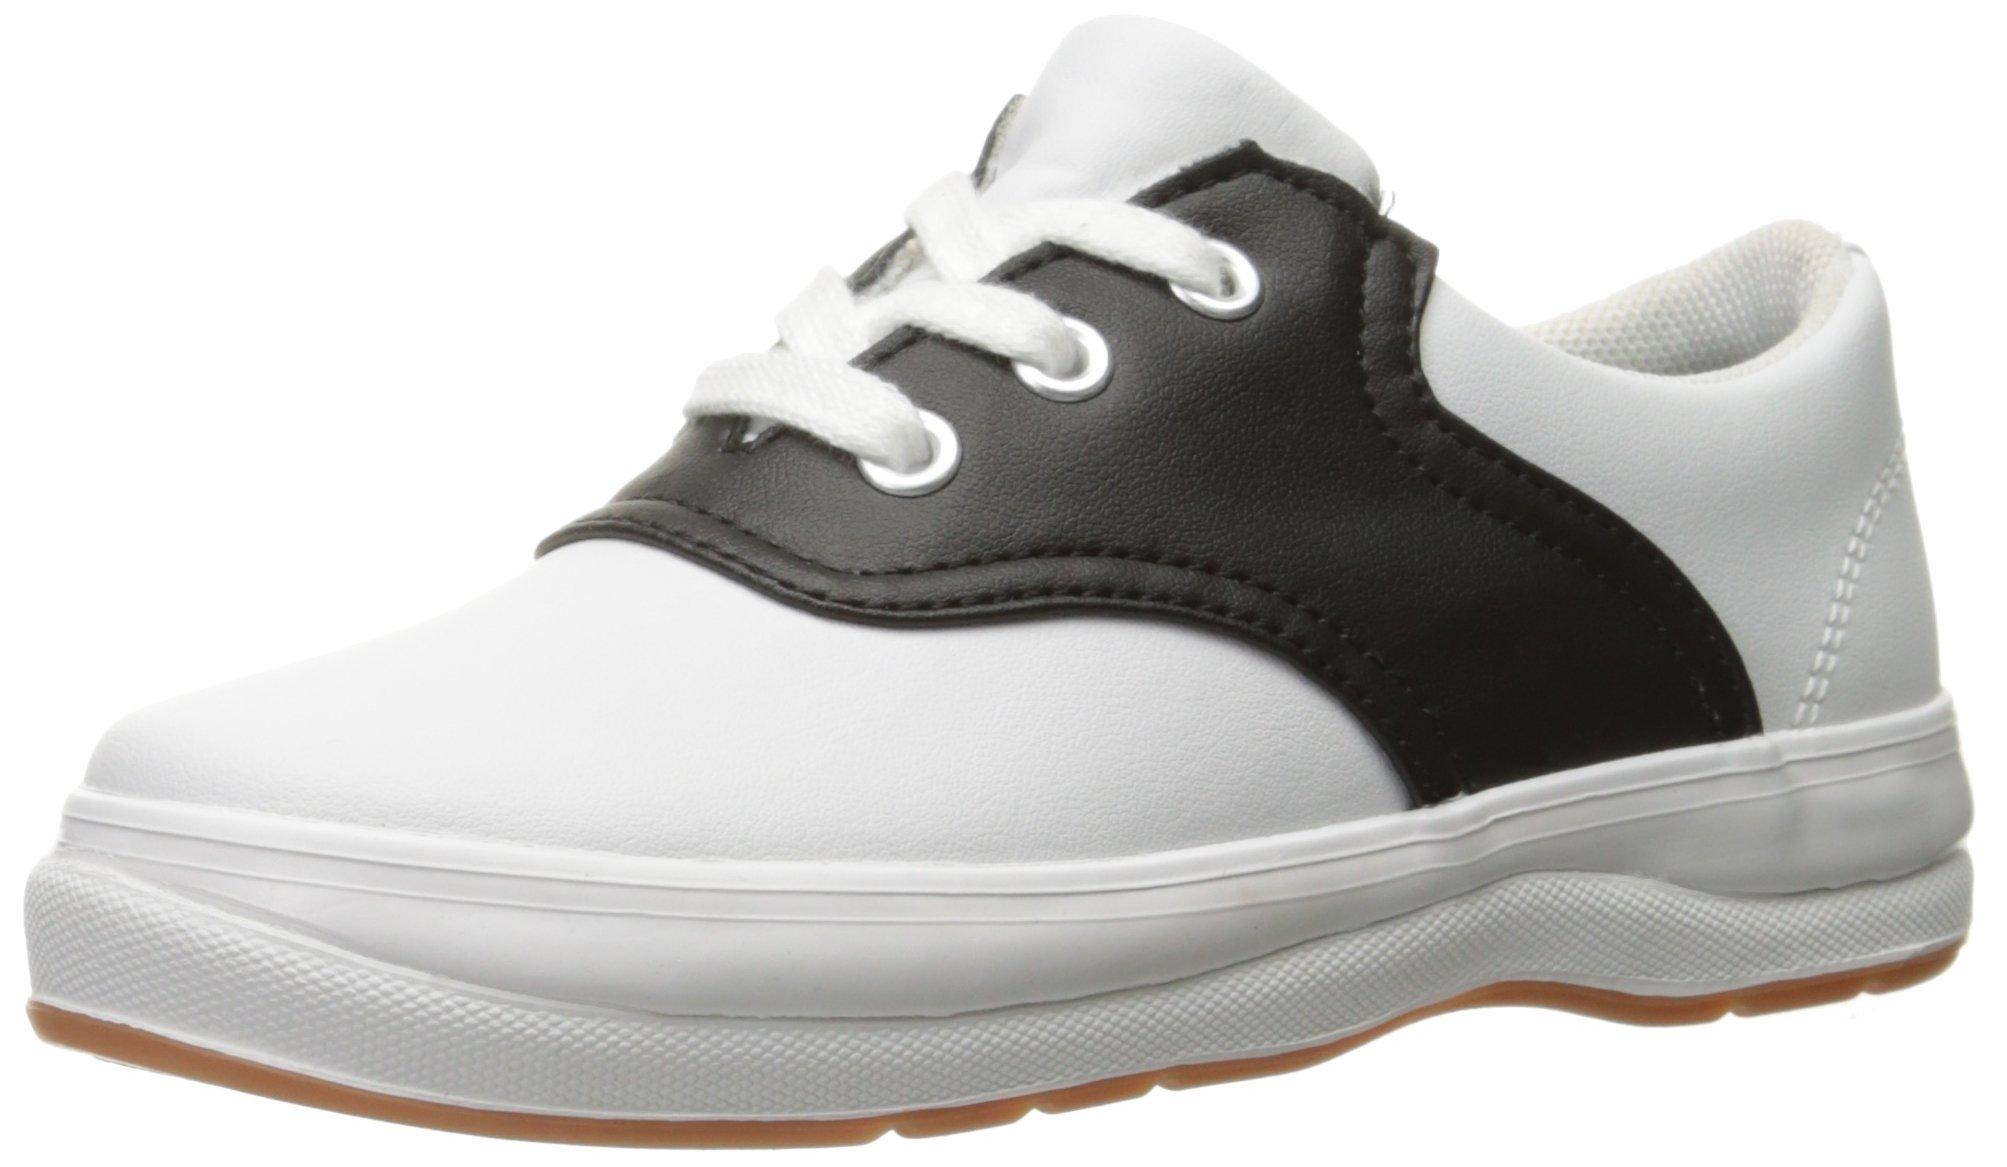 Keds School Days II Uniform Sneaker (Toddler/Little Kid), White/Black, 12 M US Little Kid